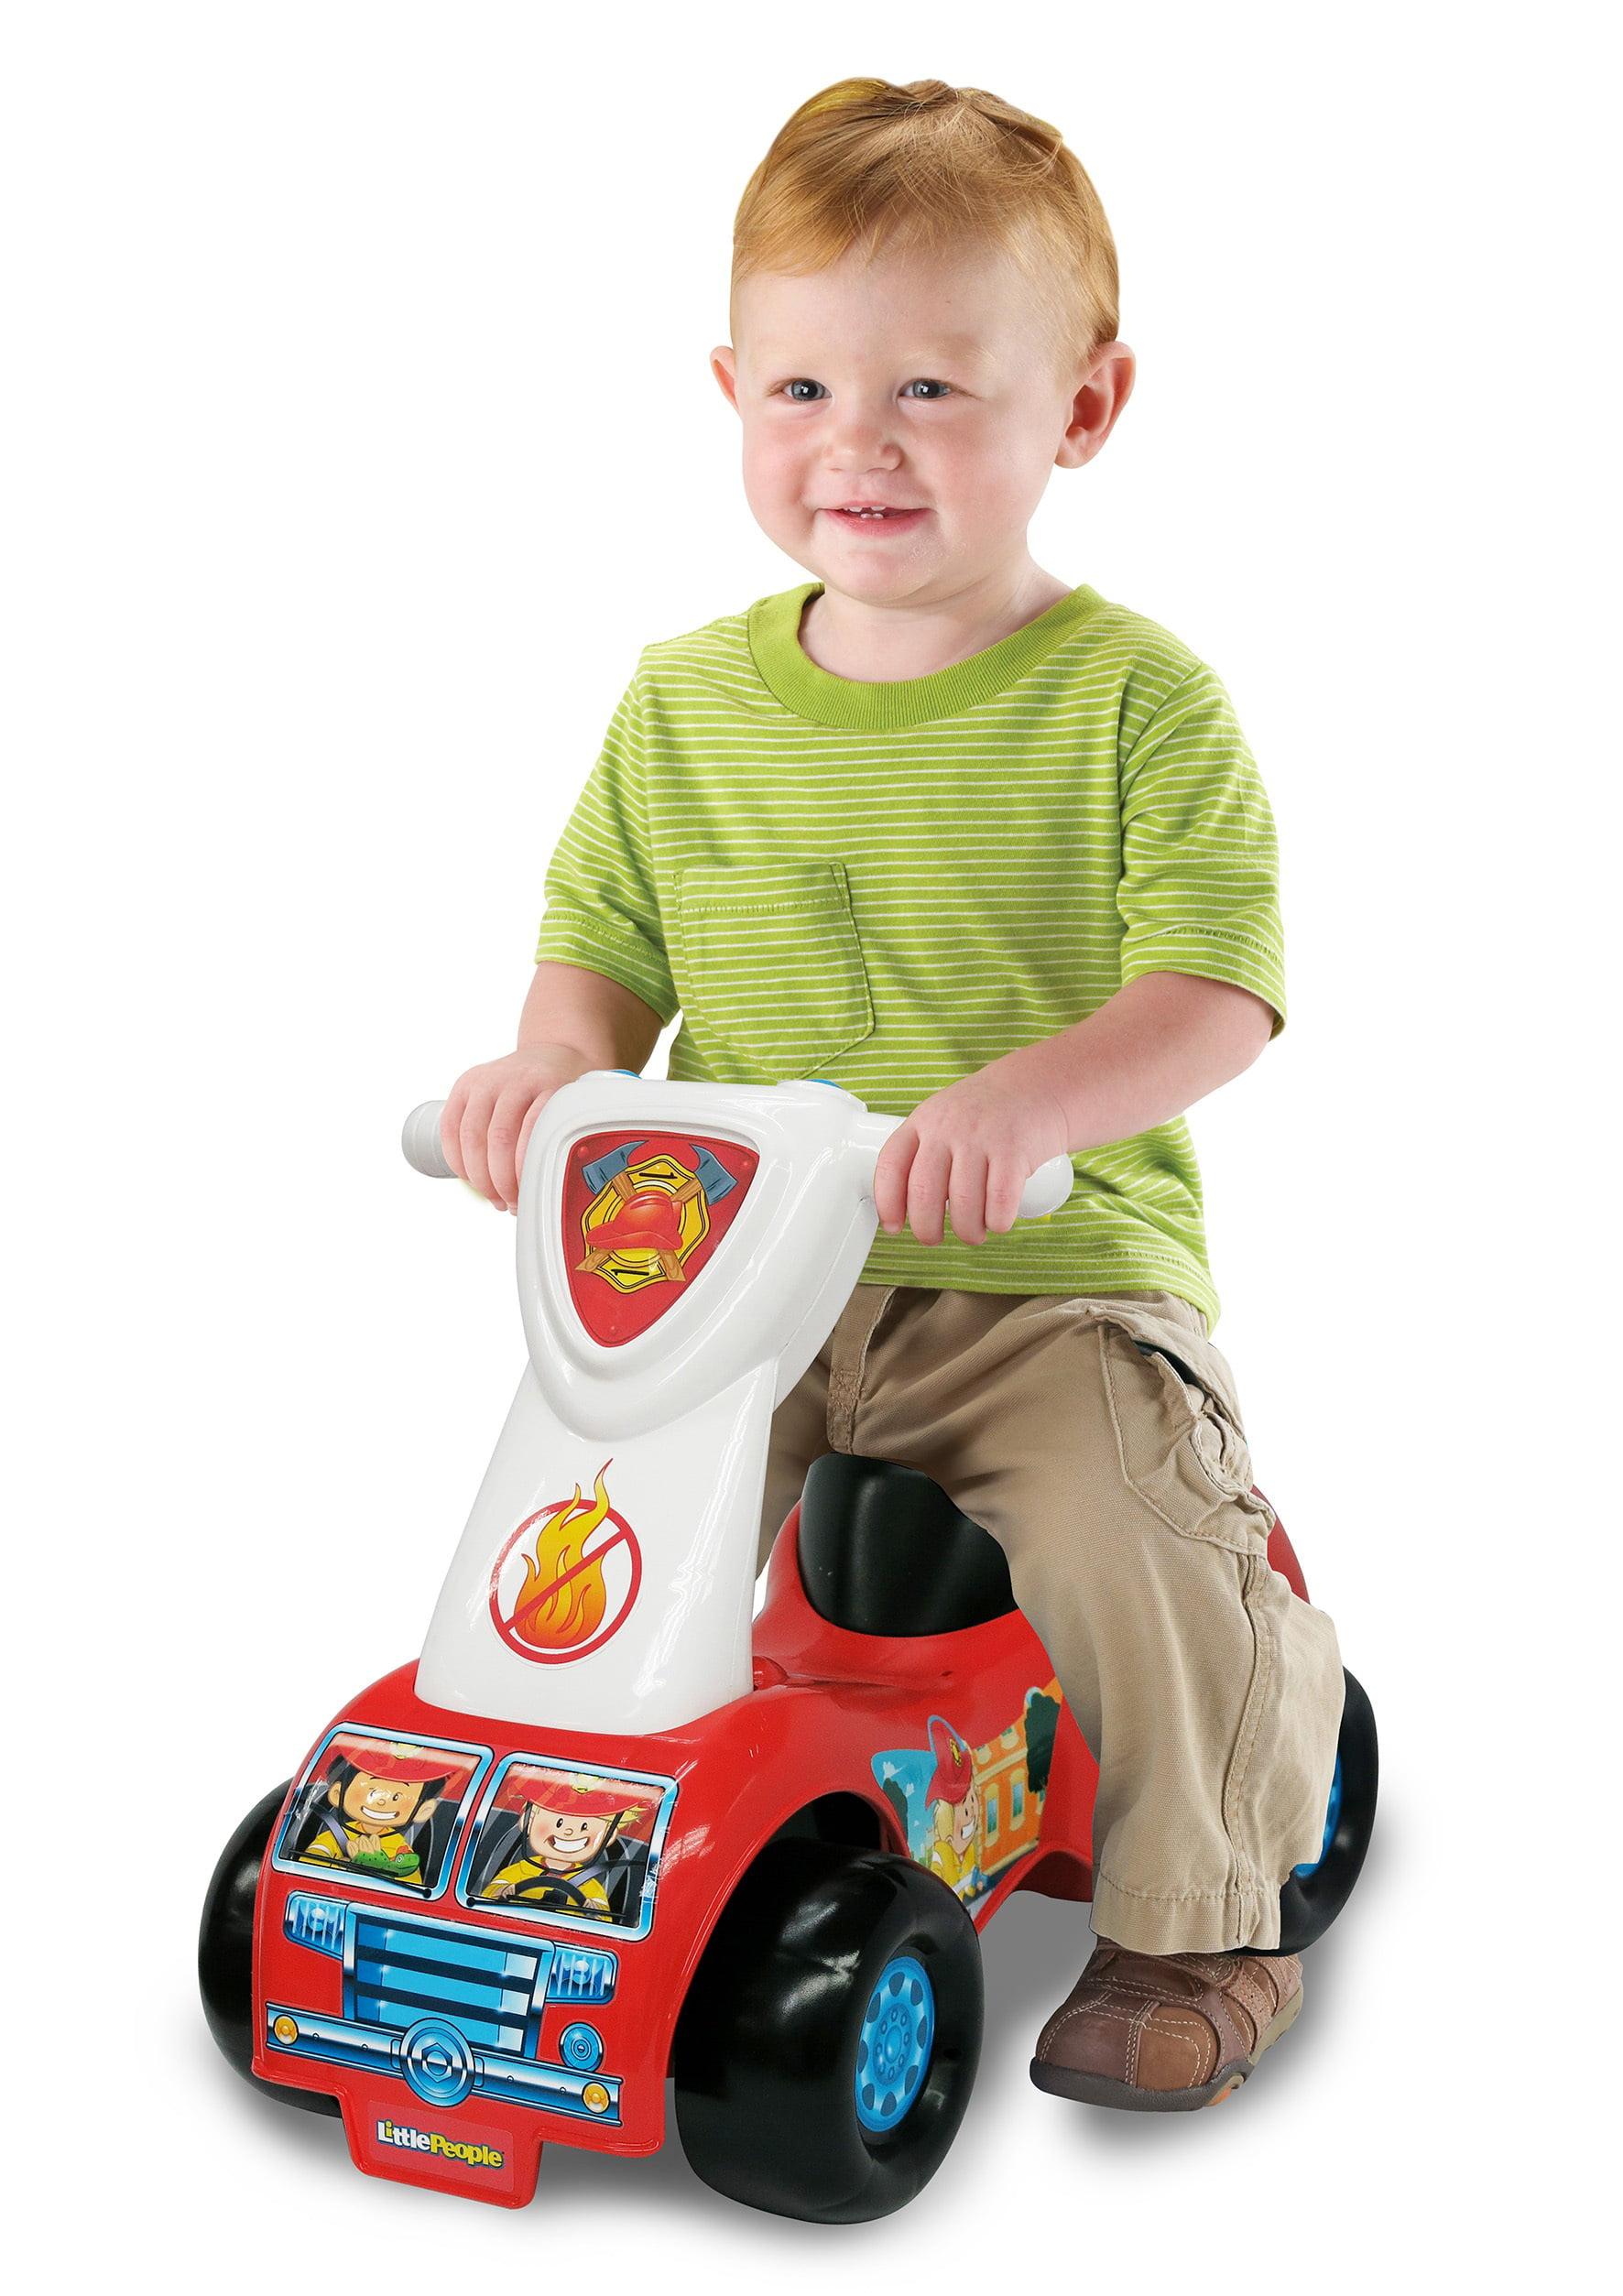 Fisher Price Kids Bikes & Riding Toys Walmart